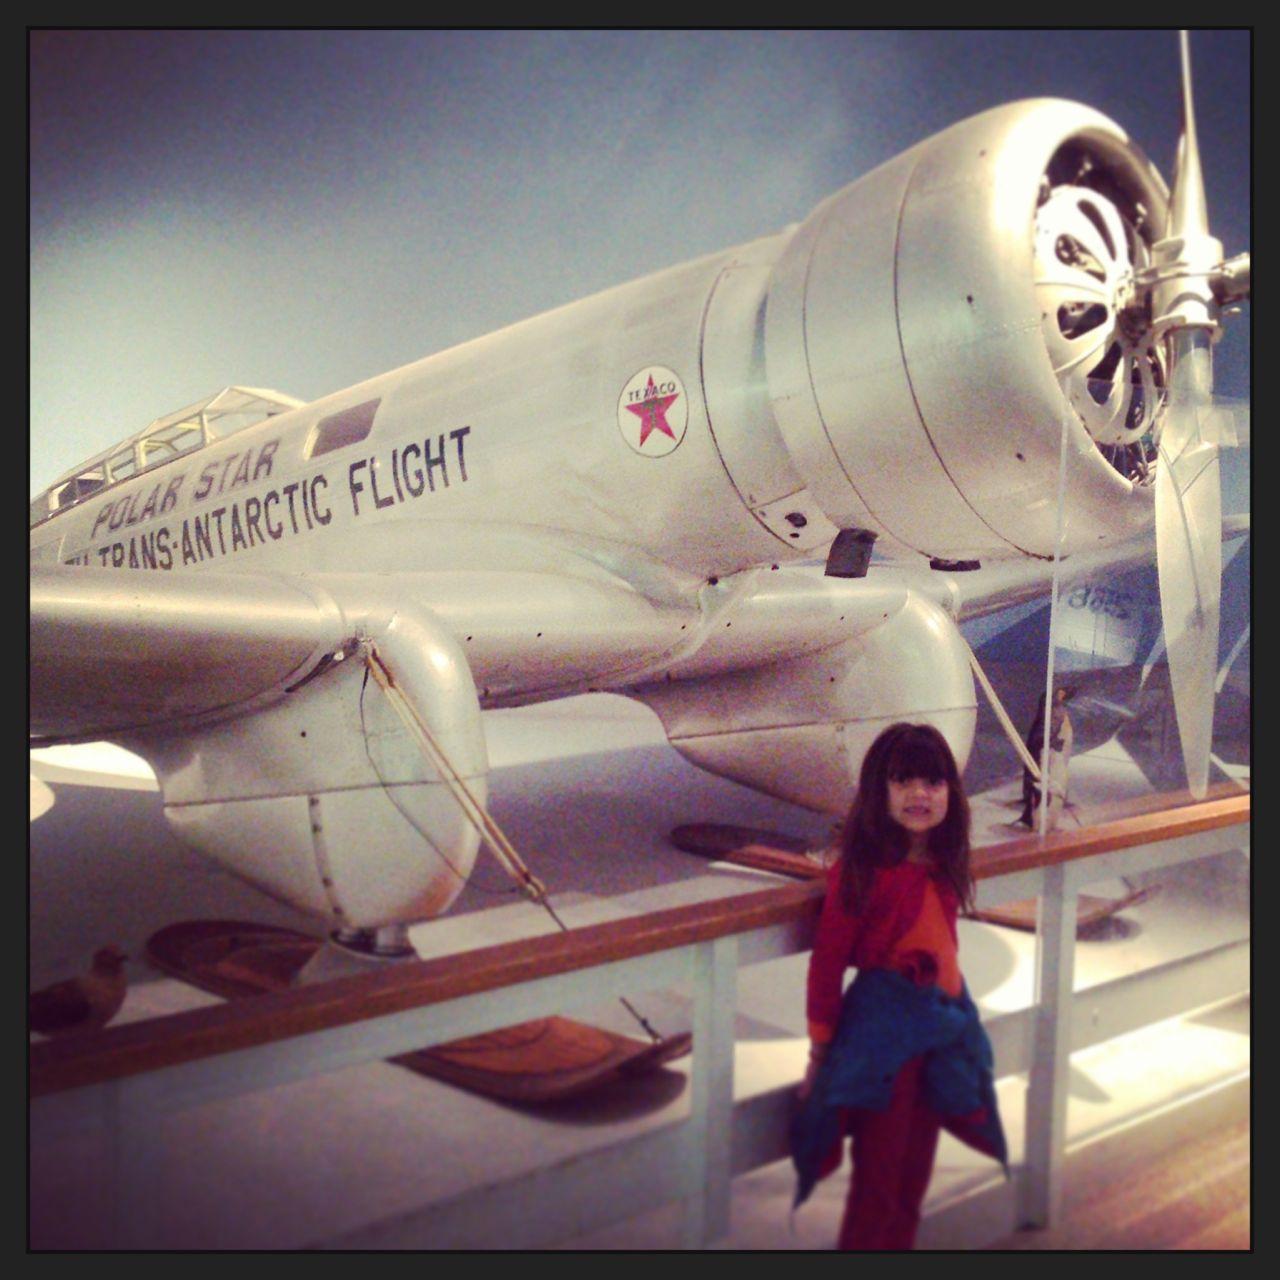 morgan and plane